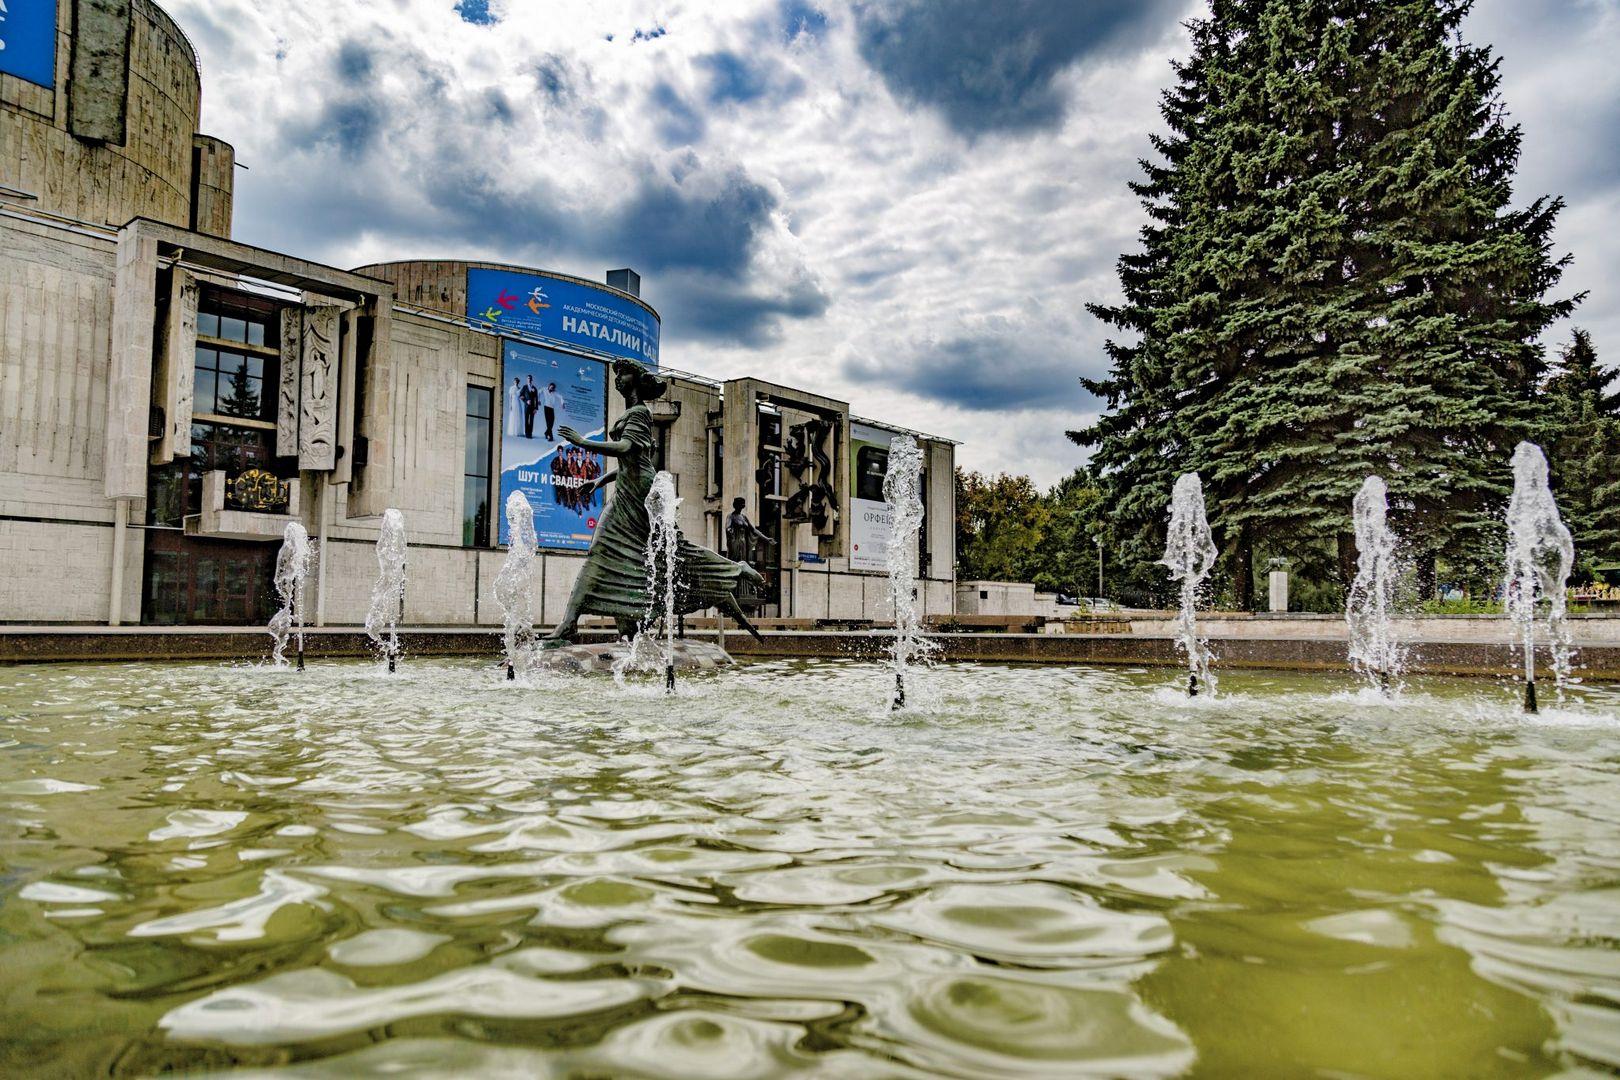 фонтаны, театр имени Натальи Сац